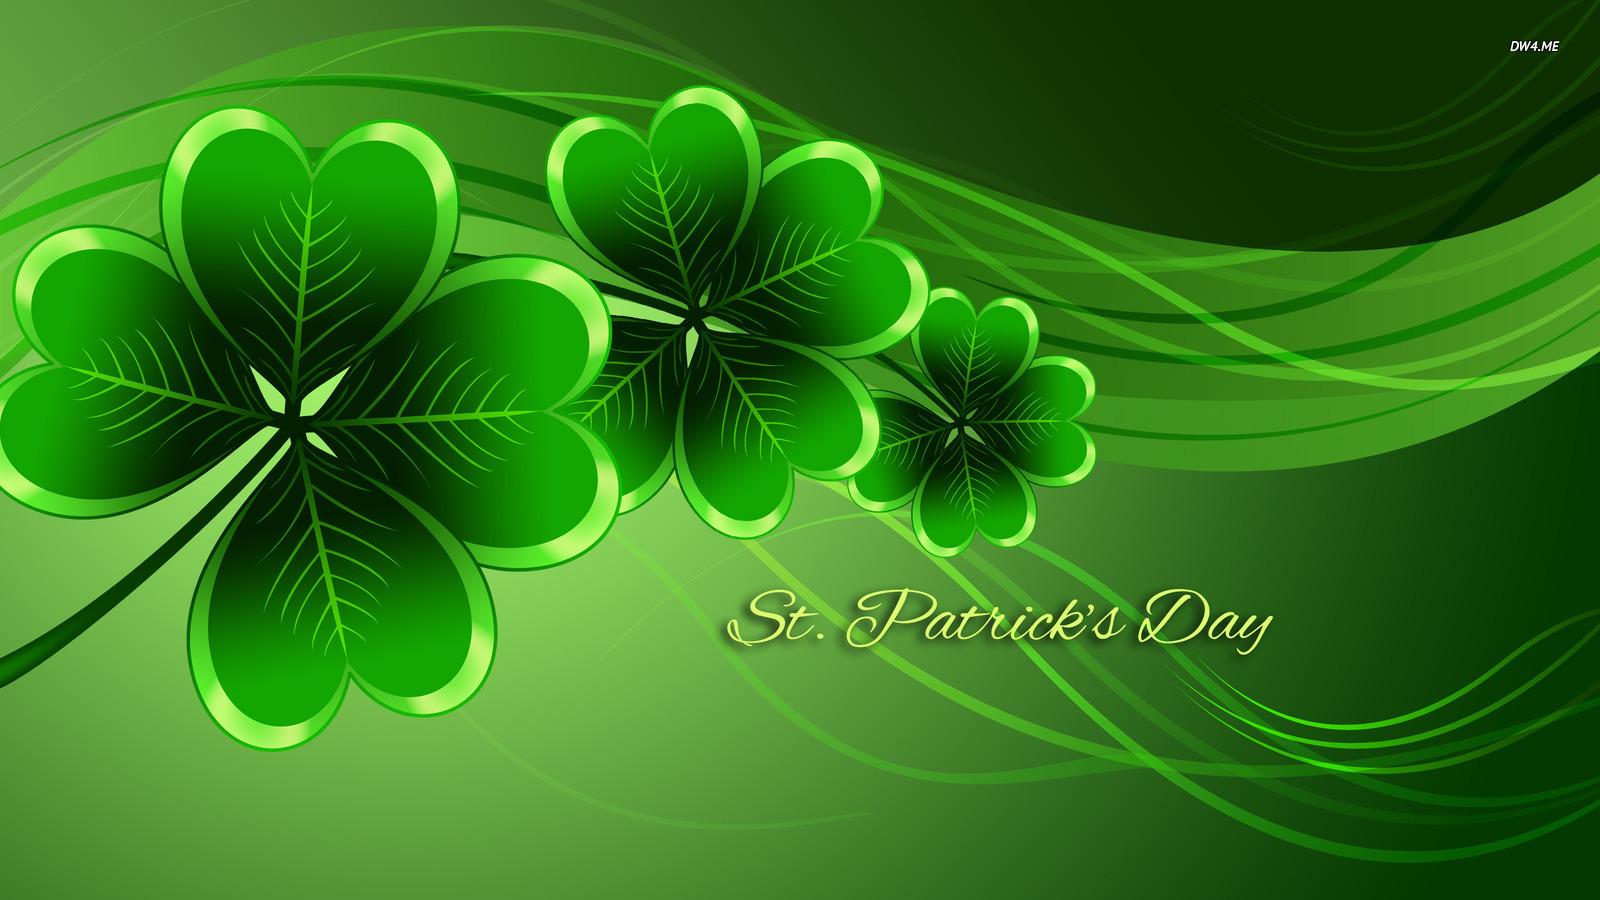 Saint Patricks Day wallpaper 1600x900